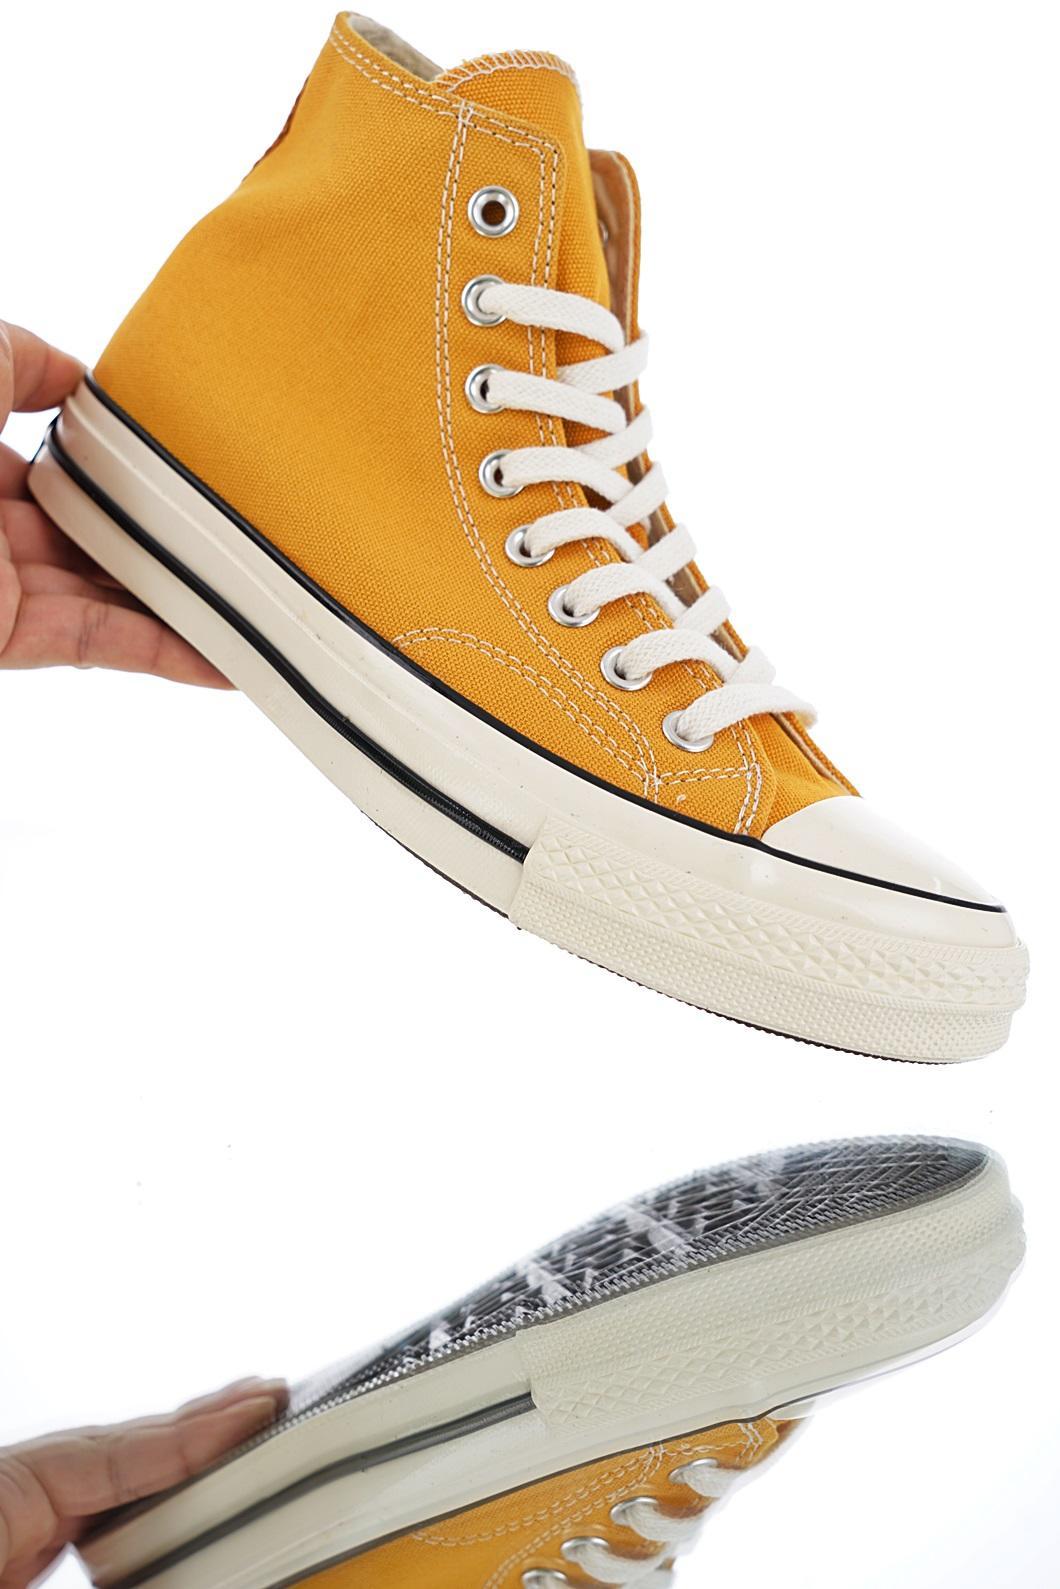 "s标的鞋_匡威Converse 1970s 三星黑标男女复刻高帮帆布鞋系列""立体标复古 ..."